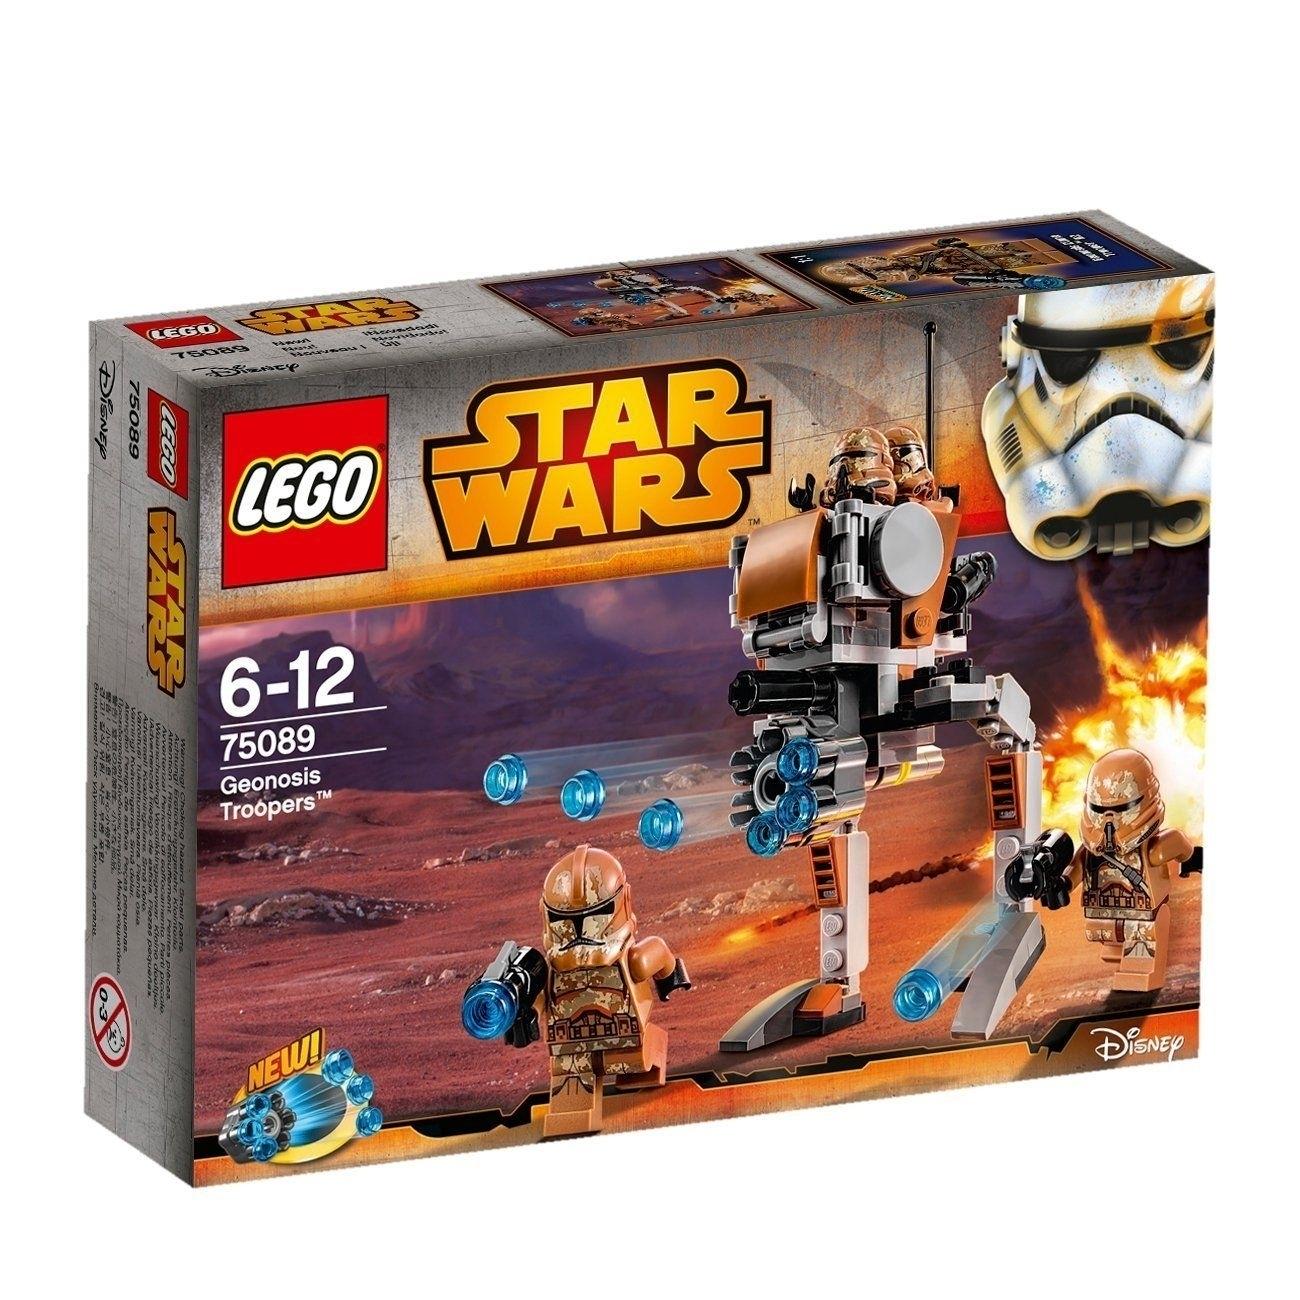 Star Wars Lego Sets Codes | Template Calendar Printable with Star Wars Lego Sets Codes